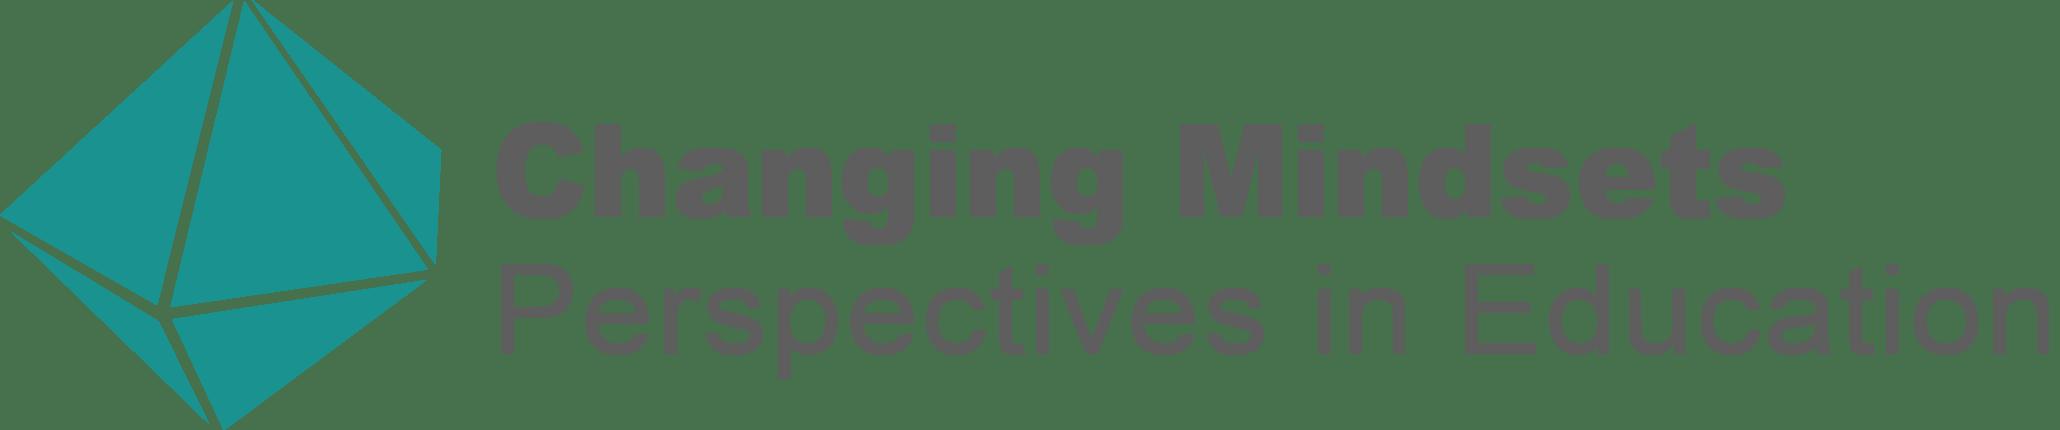 Changing Mindsets Logo